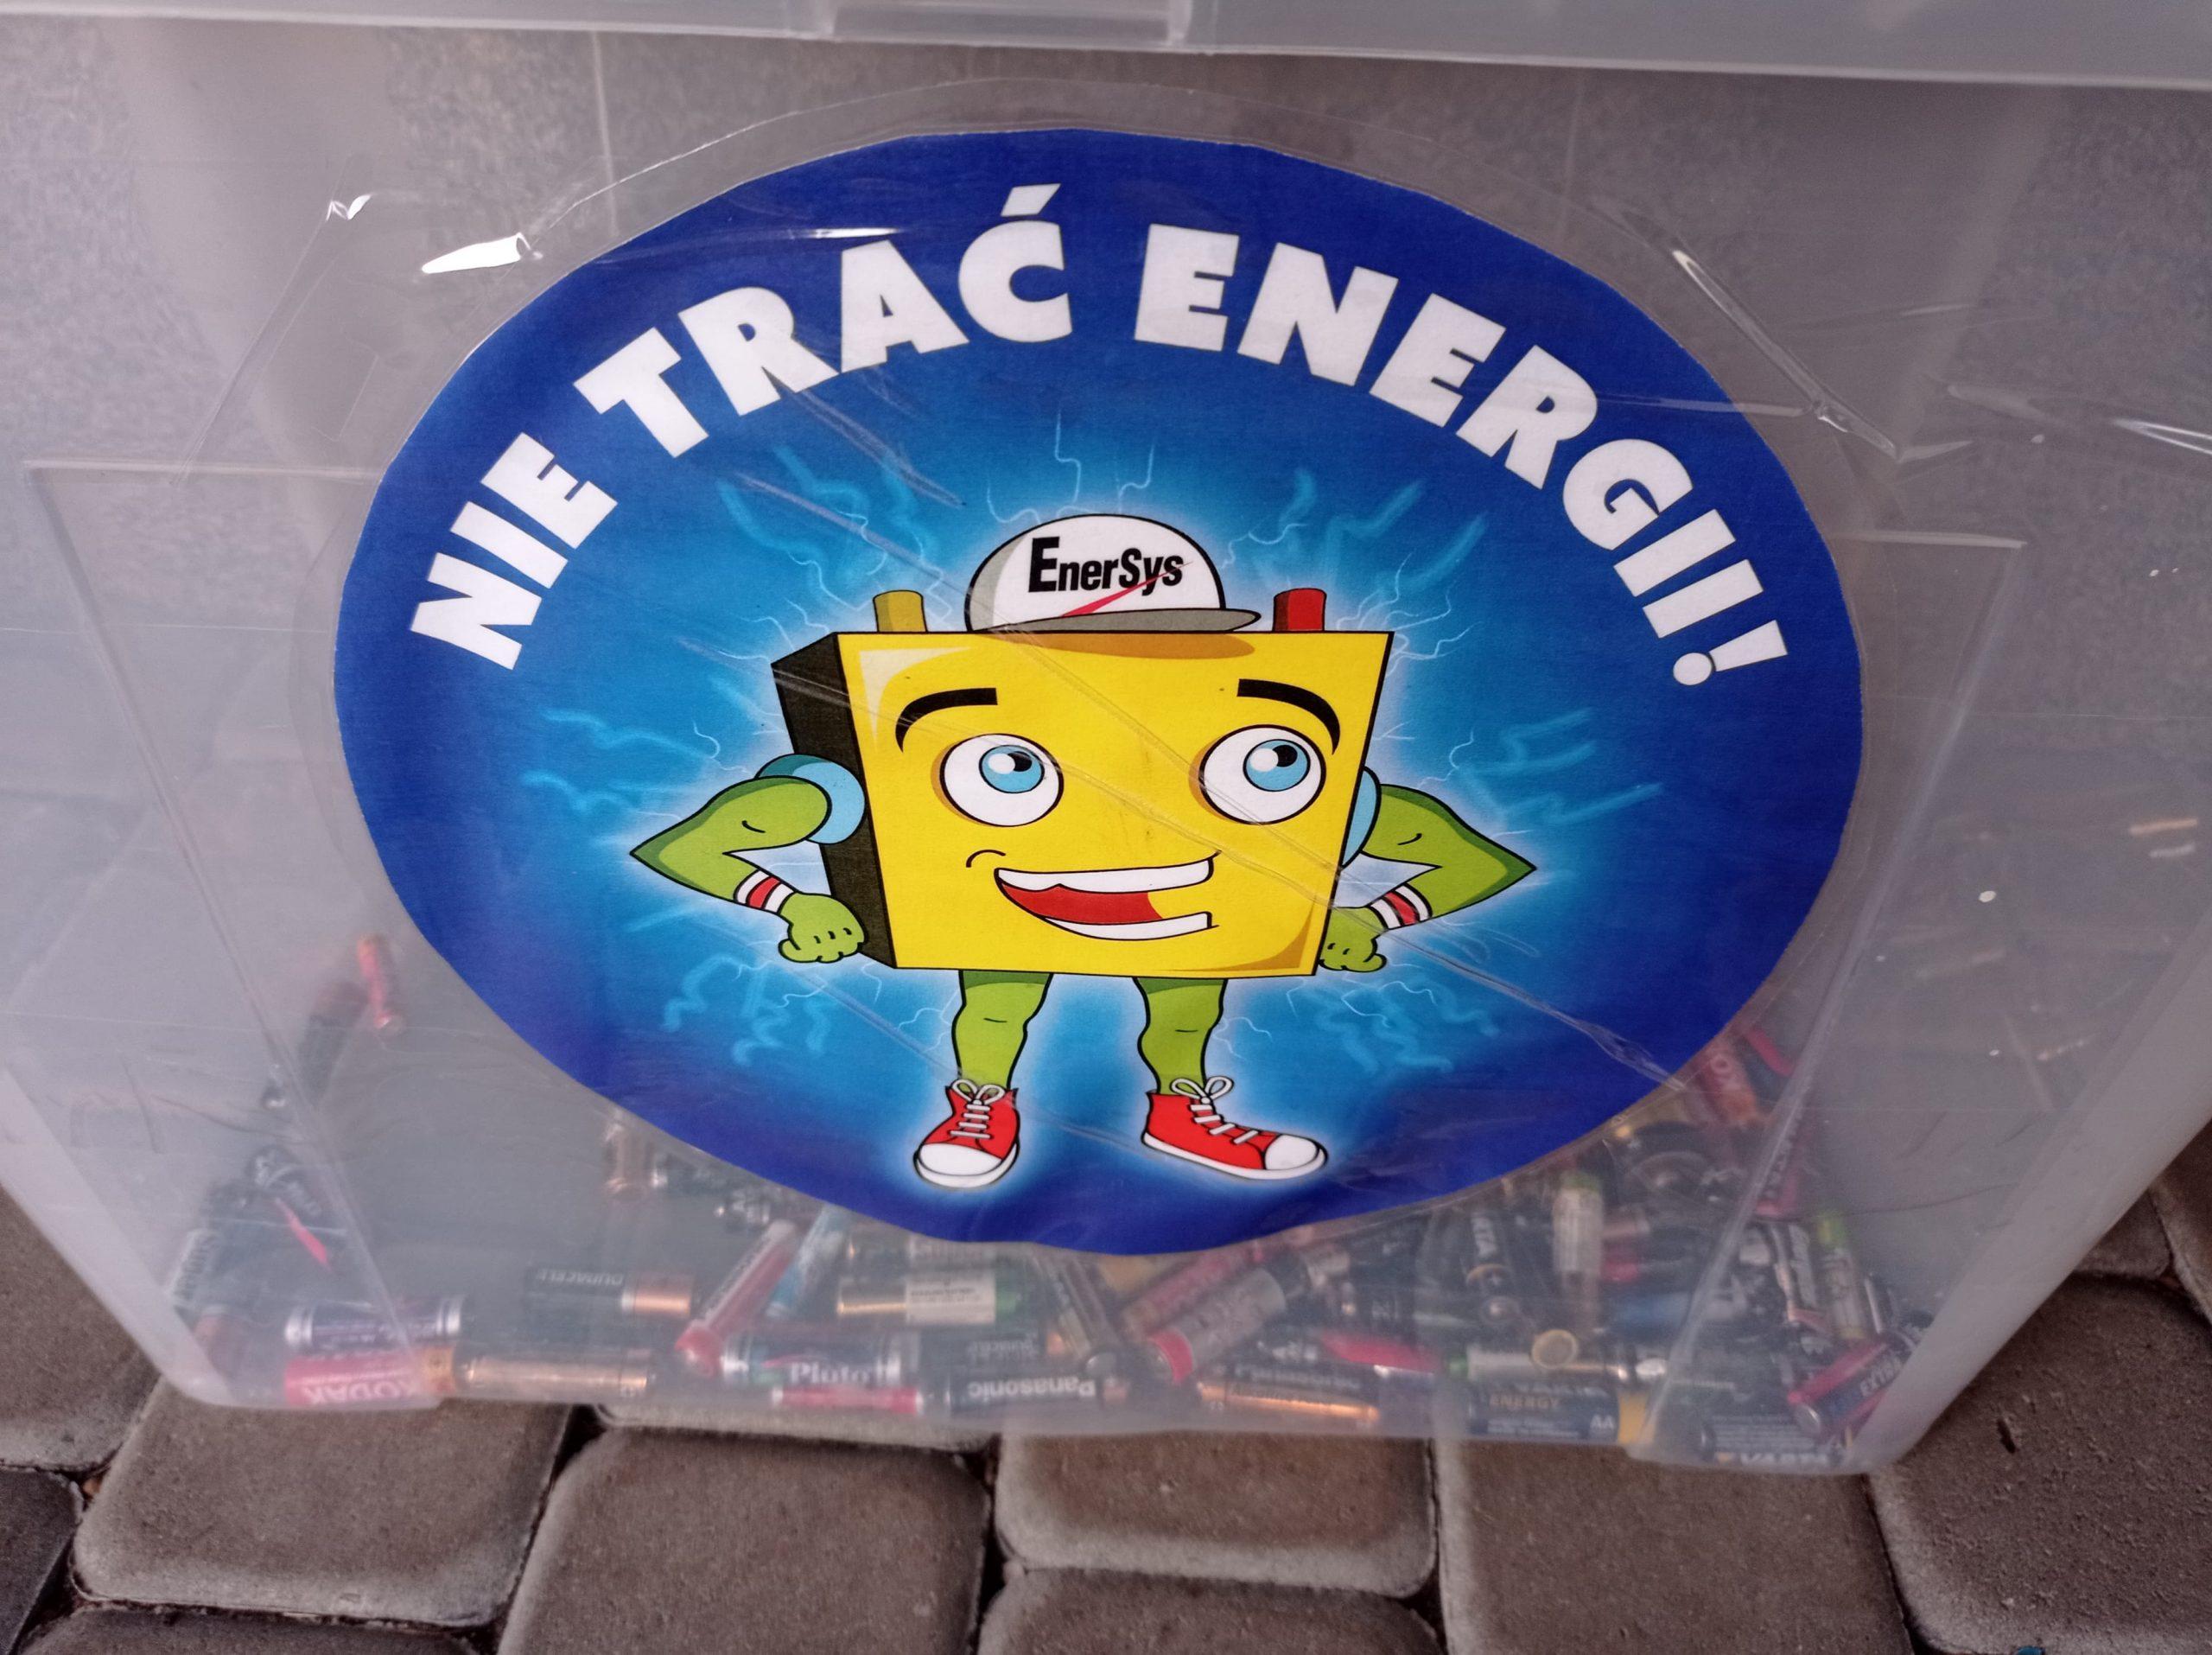 NIE TRAĆ ENERGII!